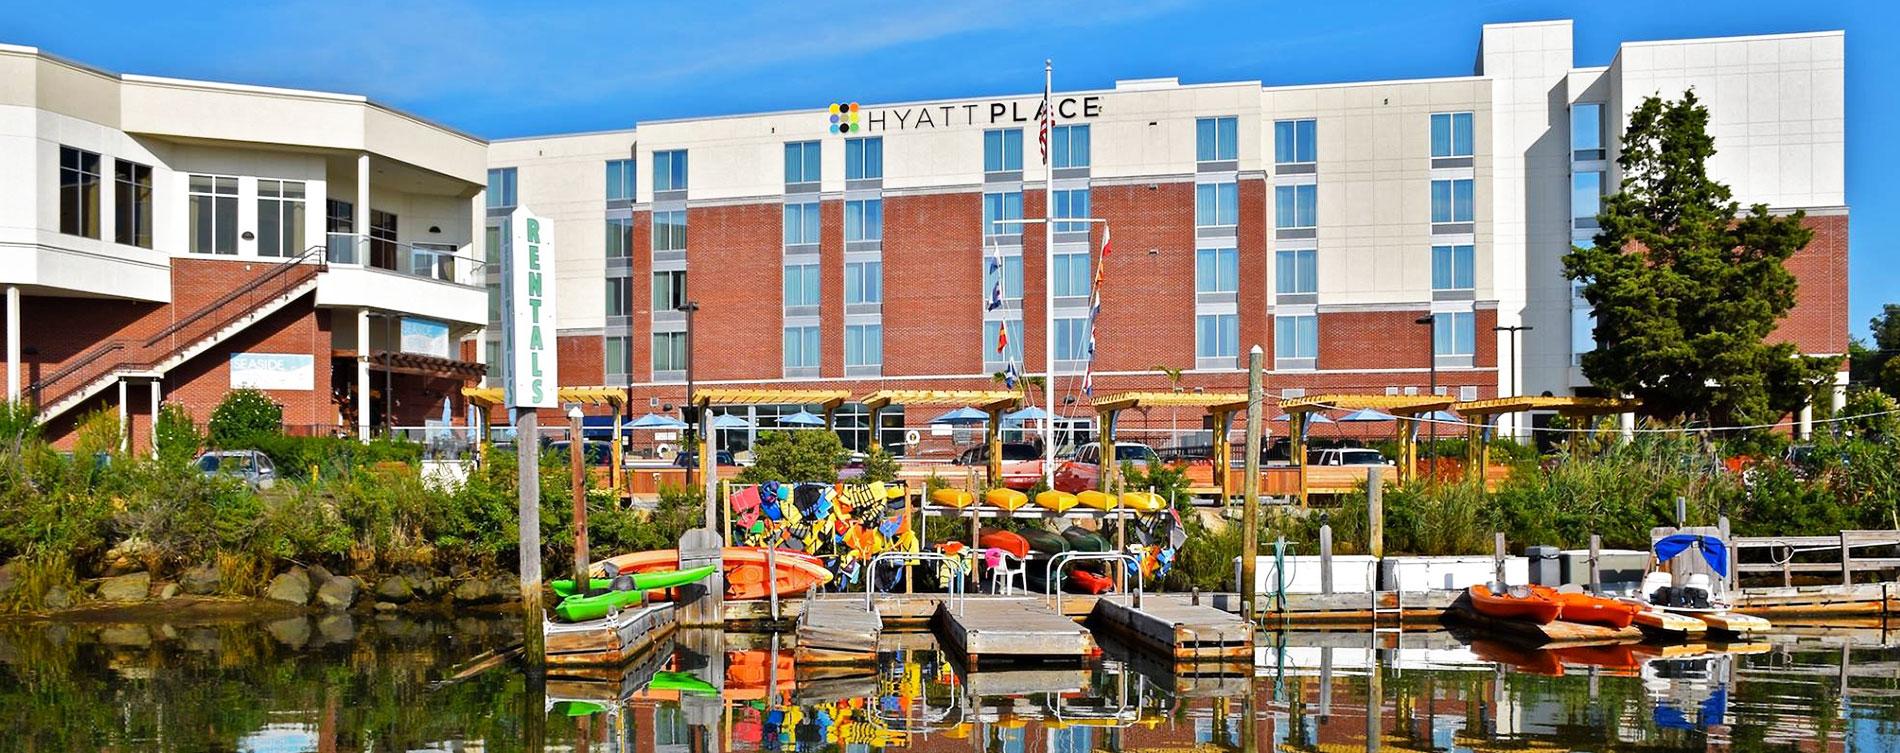 American Resort Management, Pennsylvania offers Hotel Development